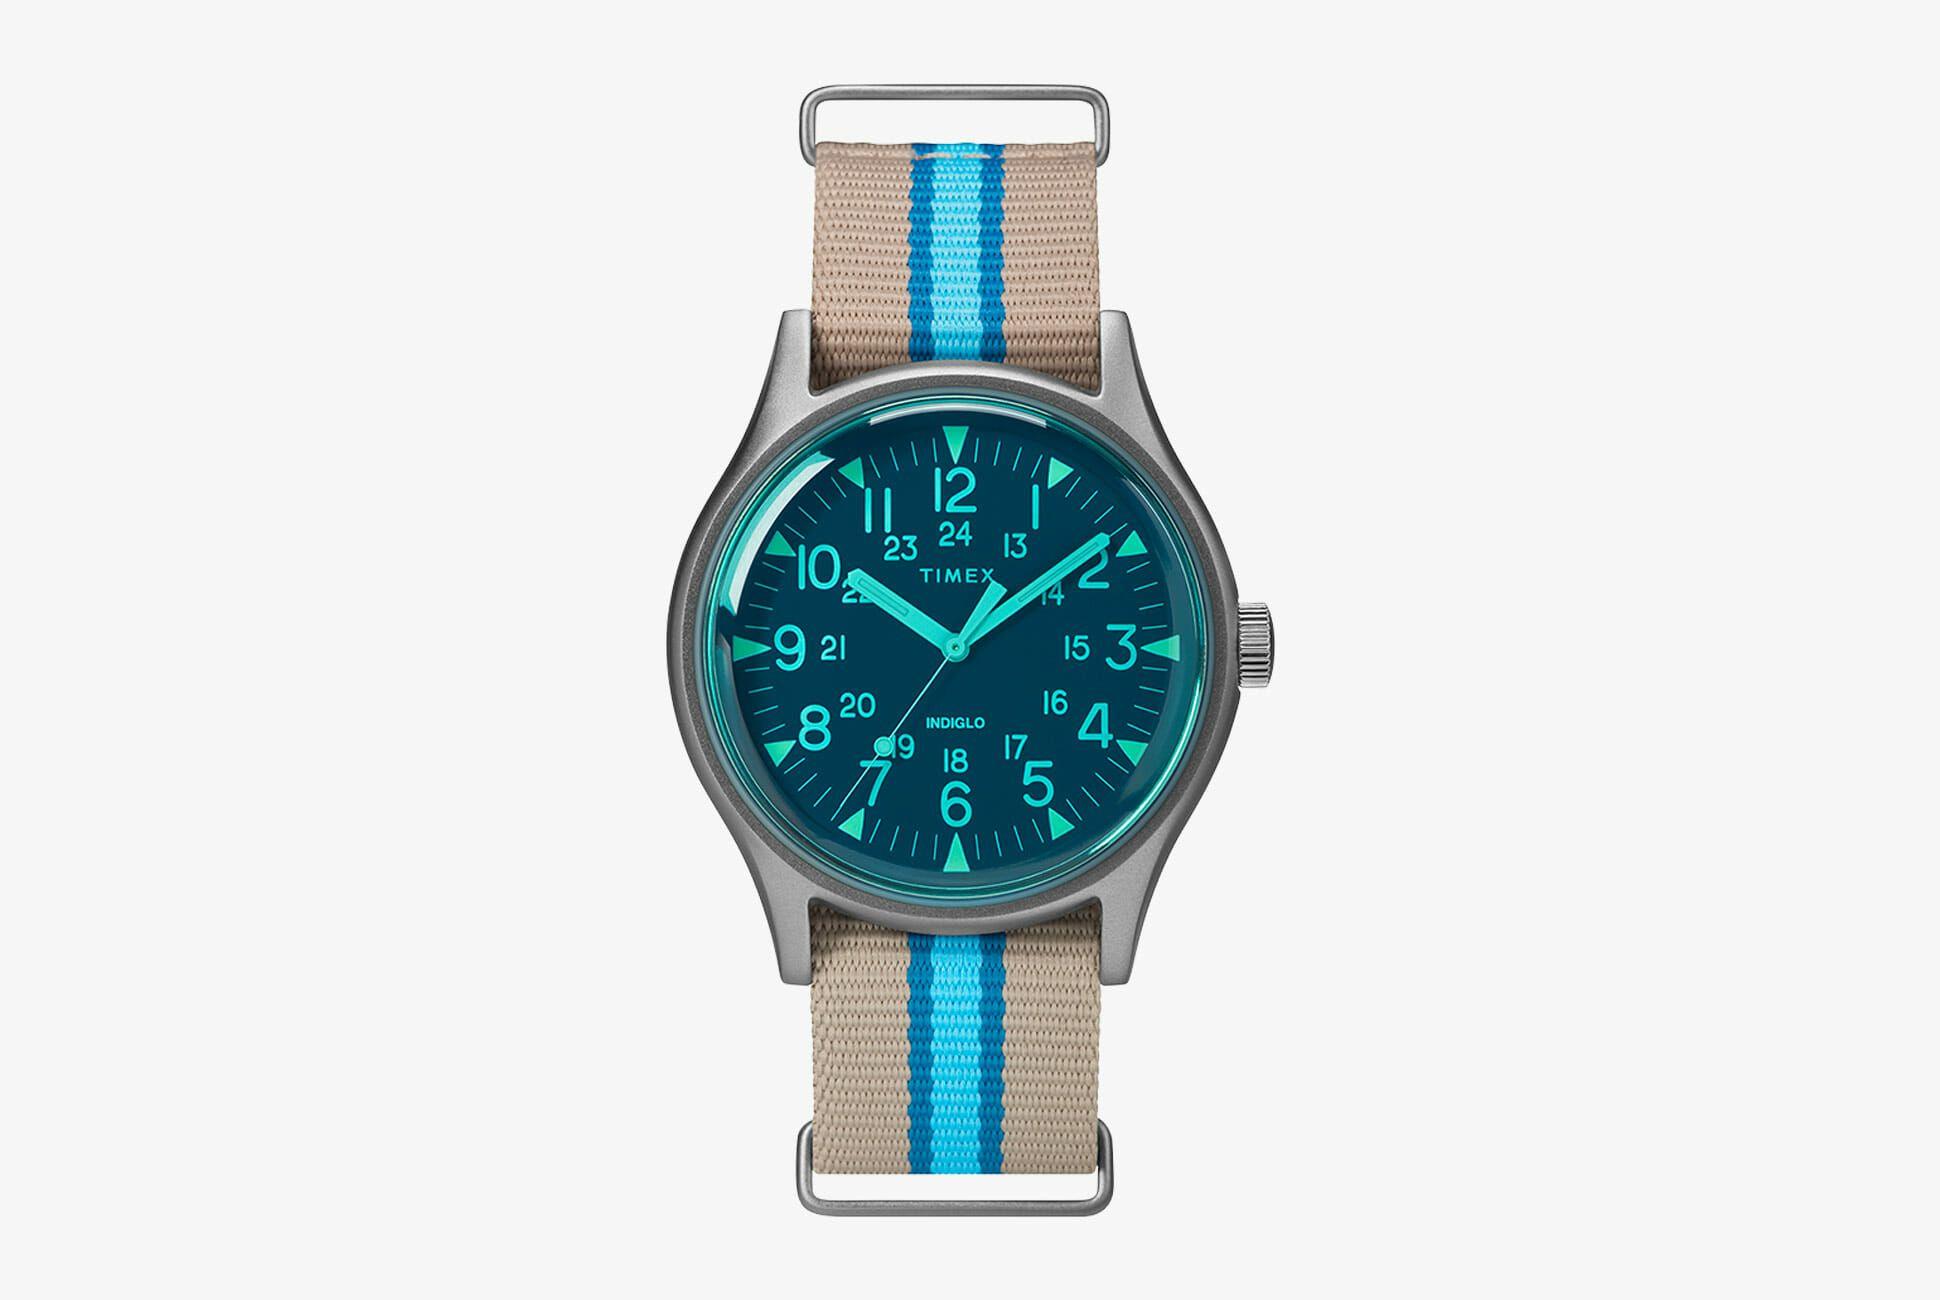 Timex-California-Deal-Gear-Patrol-Slide-6